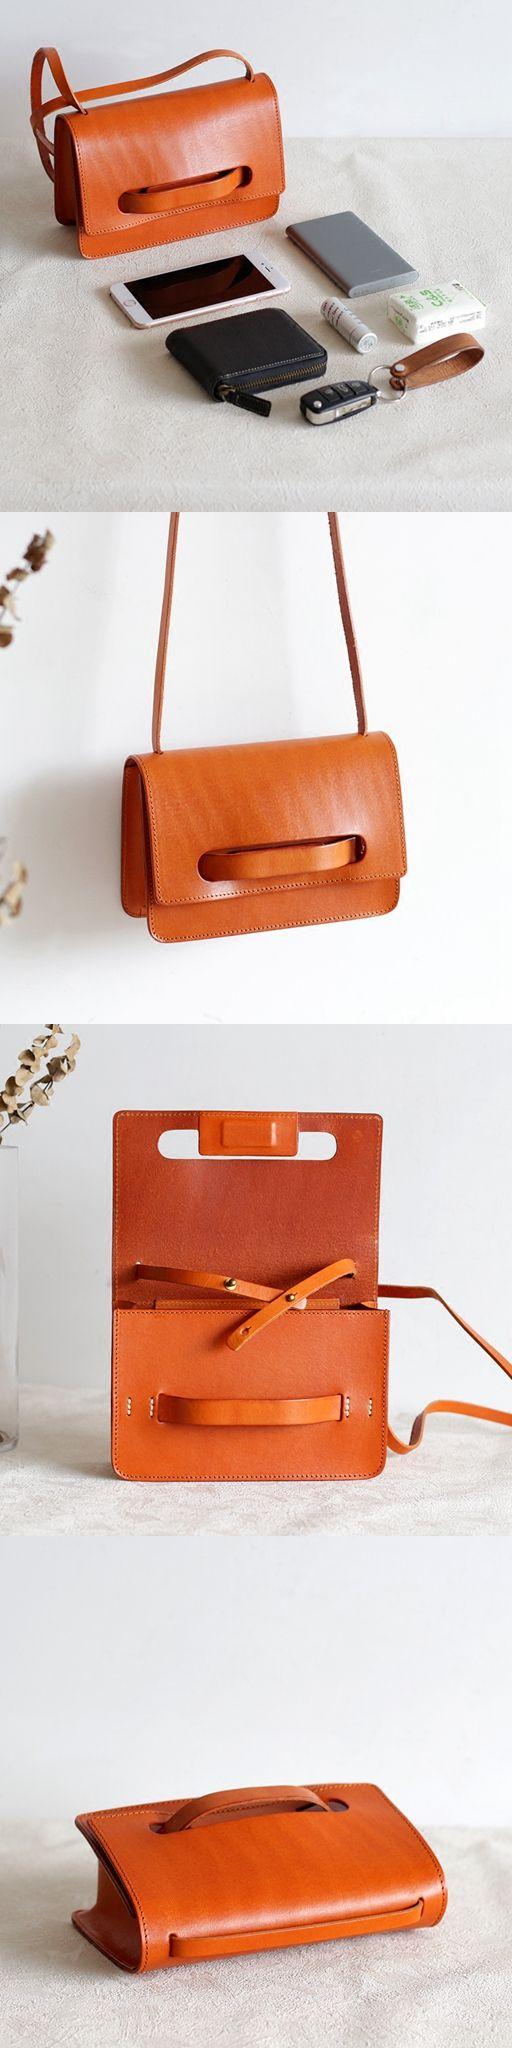 57 Best Baggs Images On Pinterest Briefcases Leather Backpacks Nucelle Women Purse Satchel Shoulder Bag Handbag Lock Gorgeous Glitter Elegant Blue Handmade Vegetable Tanned Womens Fashion Small Messenger